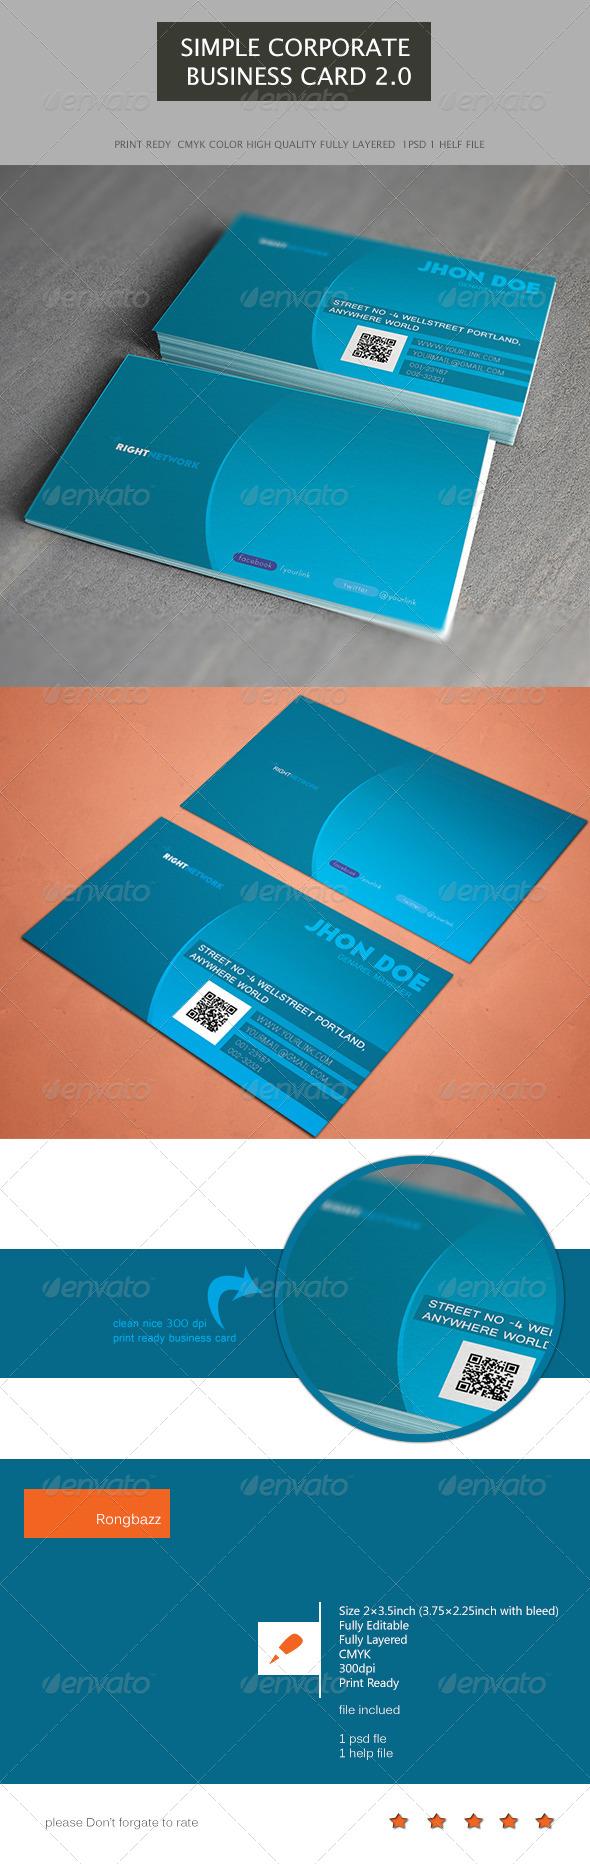 Simple Corporate Business Card 2.0 - Corporate Business Cards